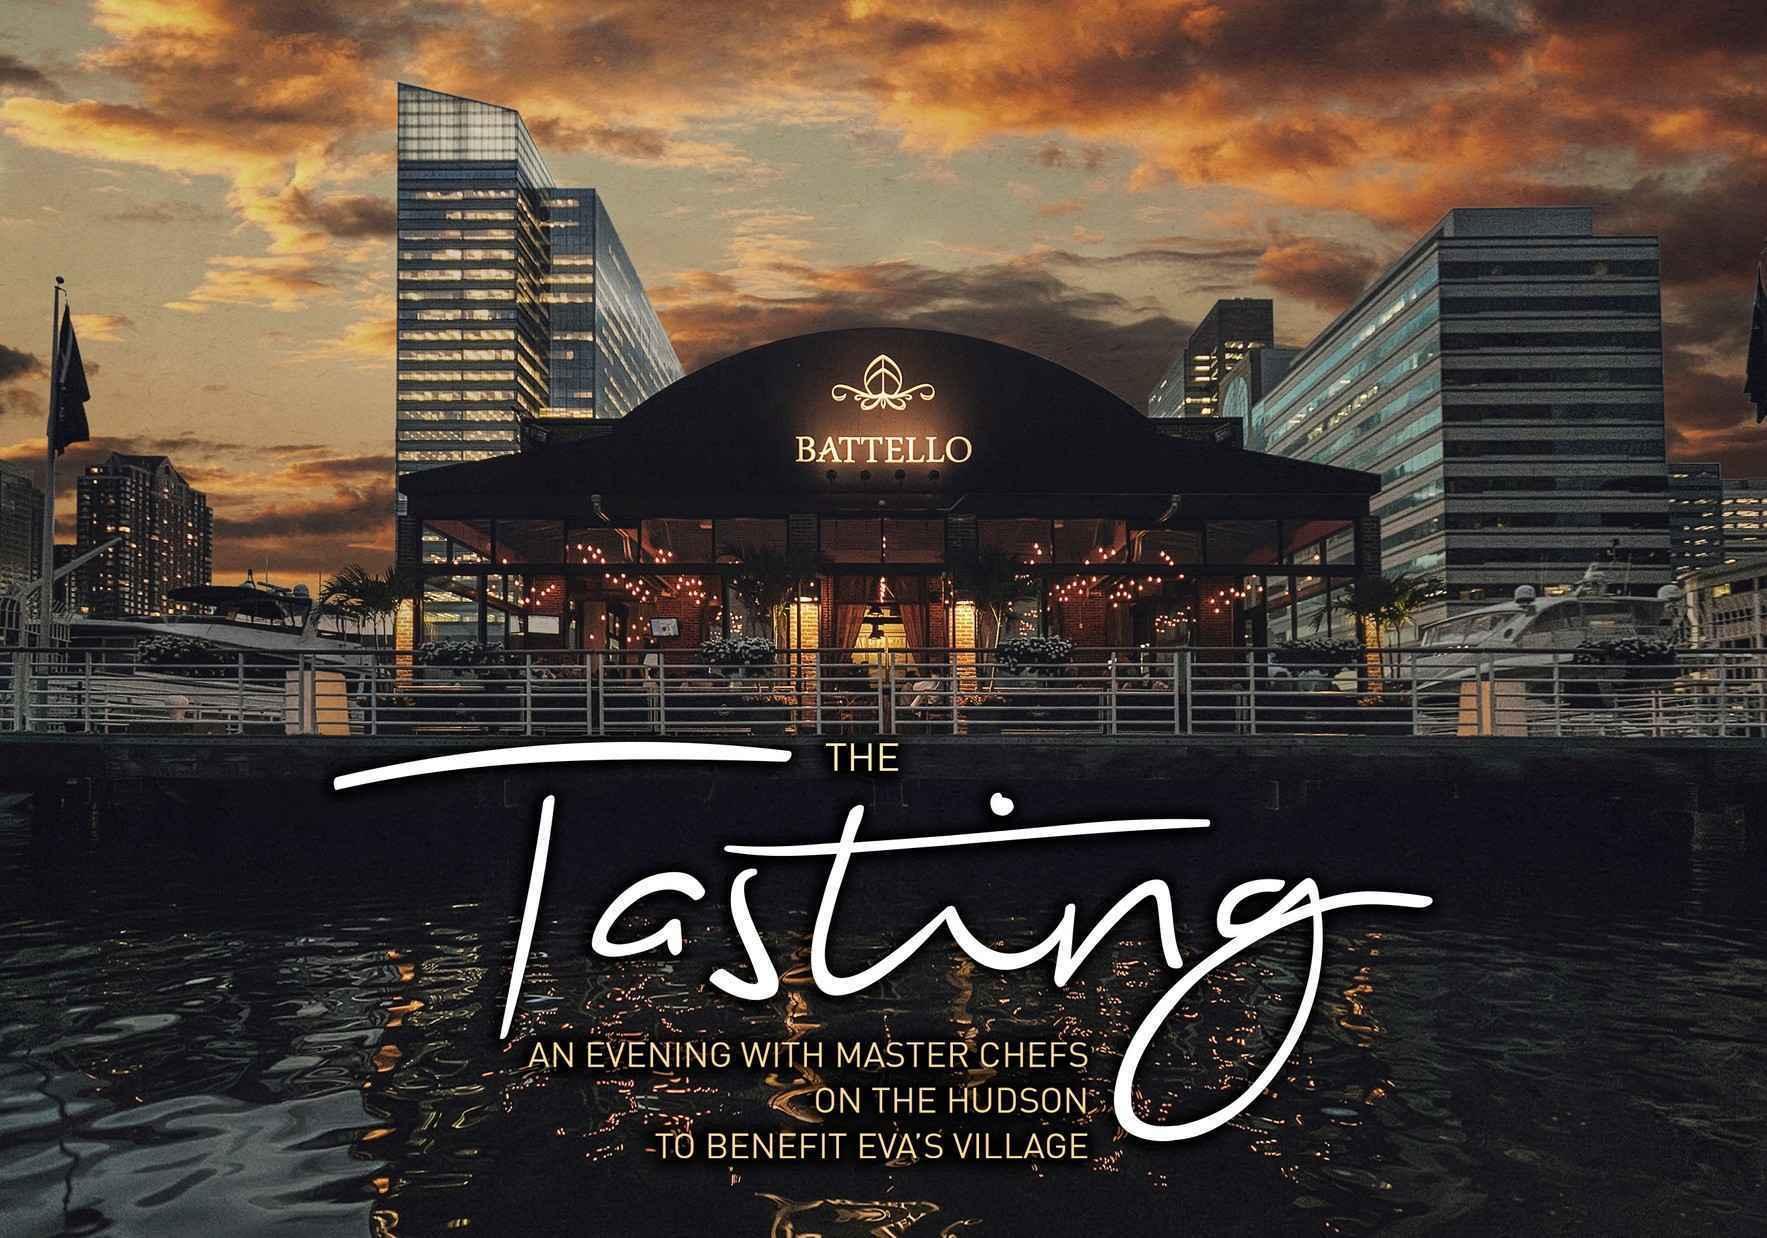 The Tasting SM image